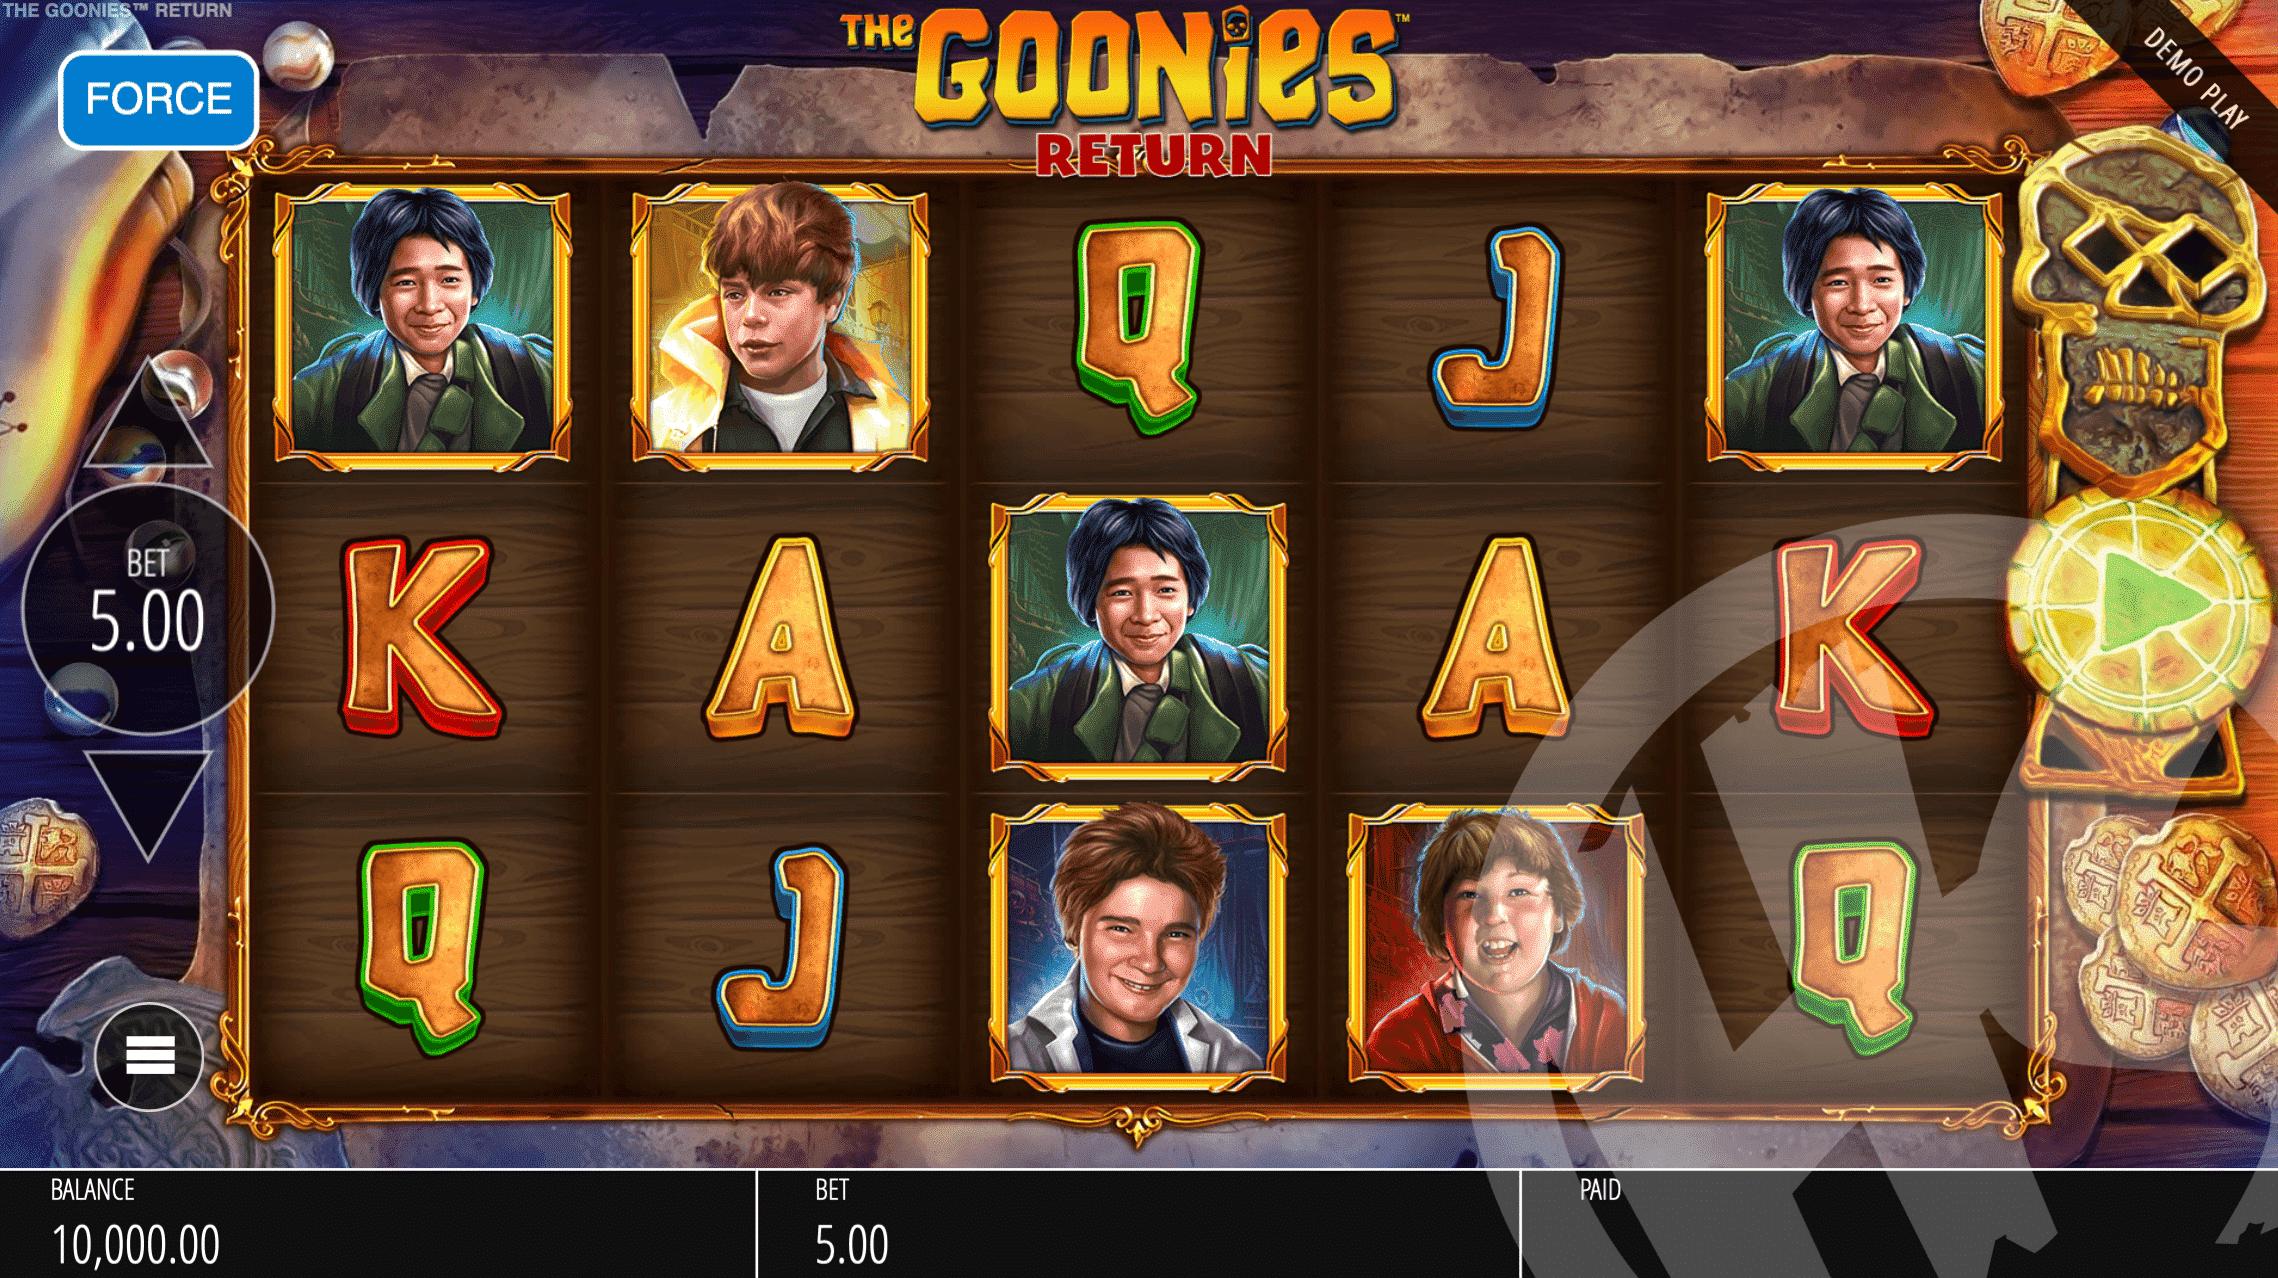 The Goonies Return Base Game